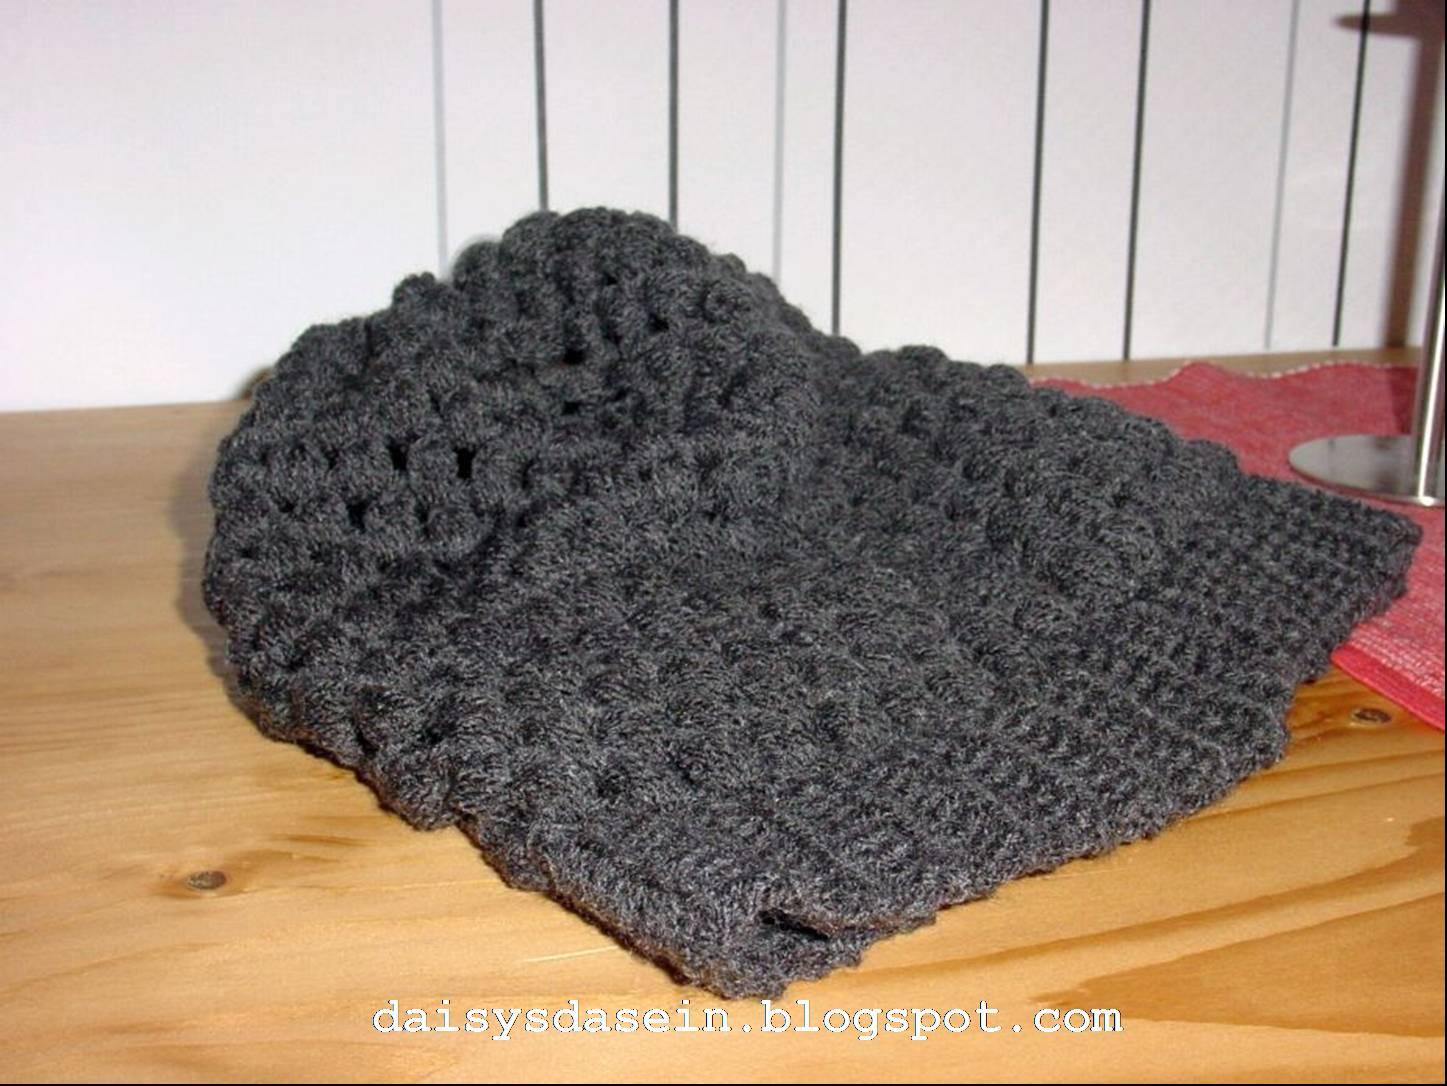 Daisys Dasein Urban Jungle Crocheted Slouchy Beanie Oder Auch